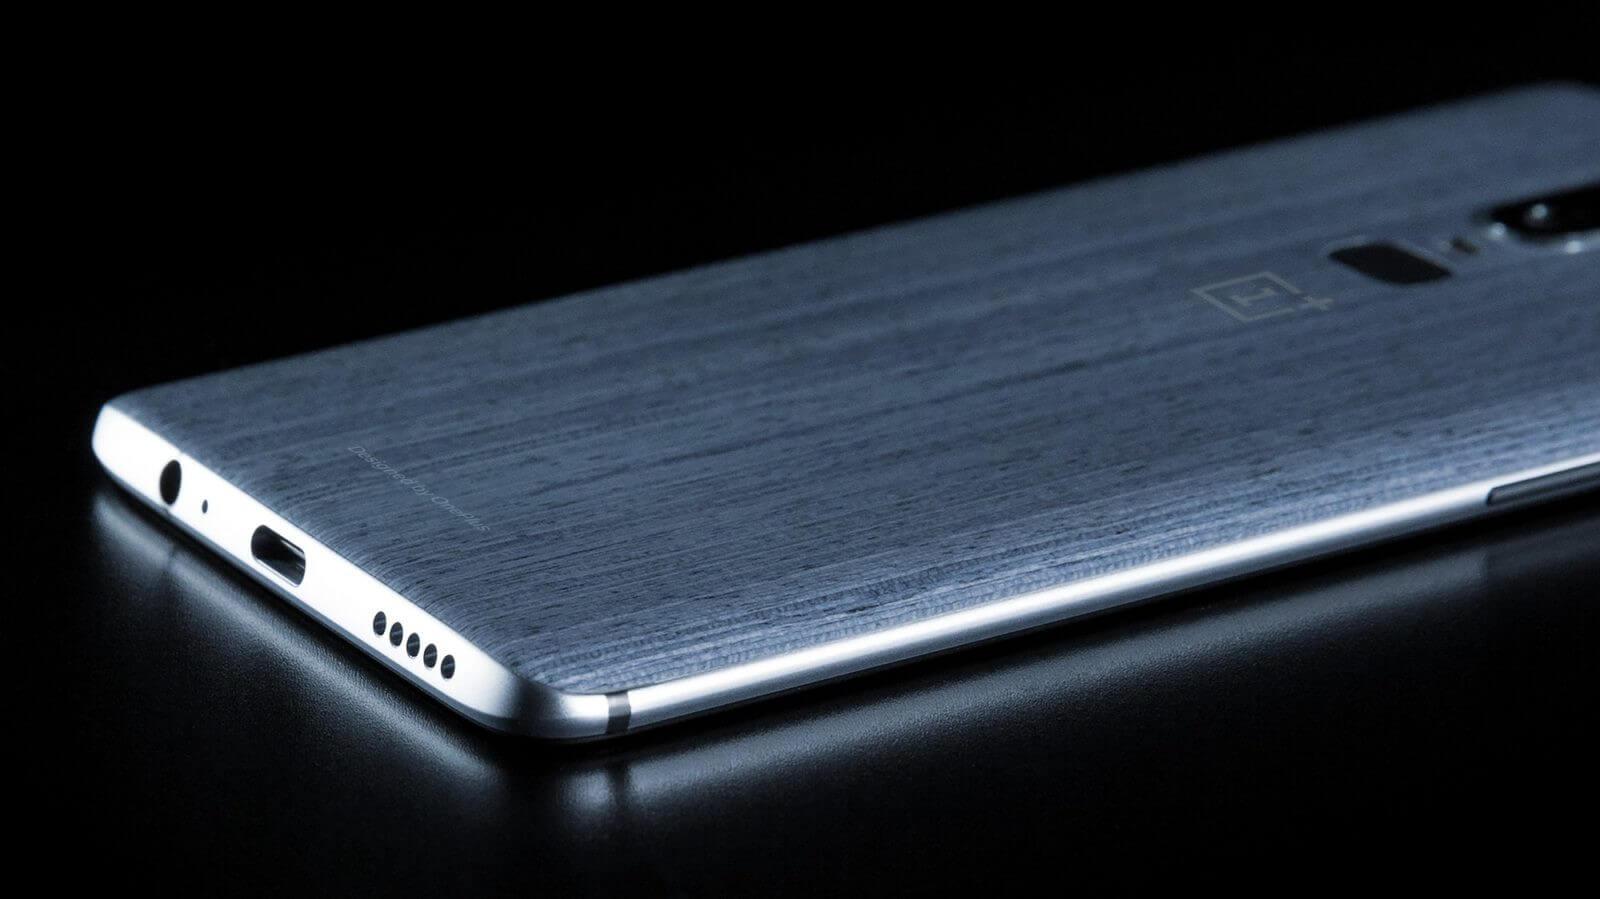 OnePlus 6 headphone jack 3.5mm